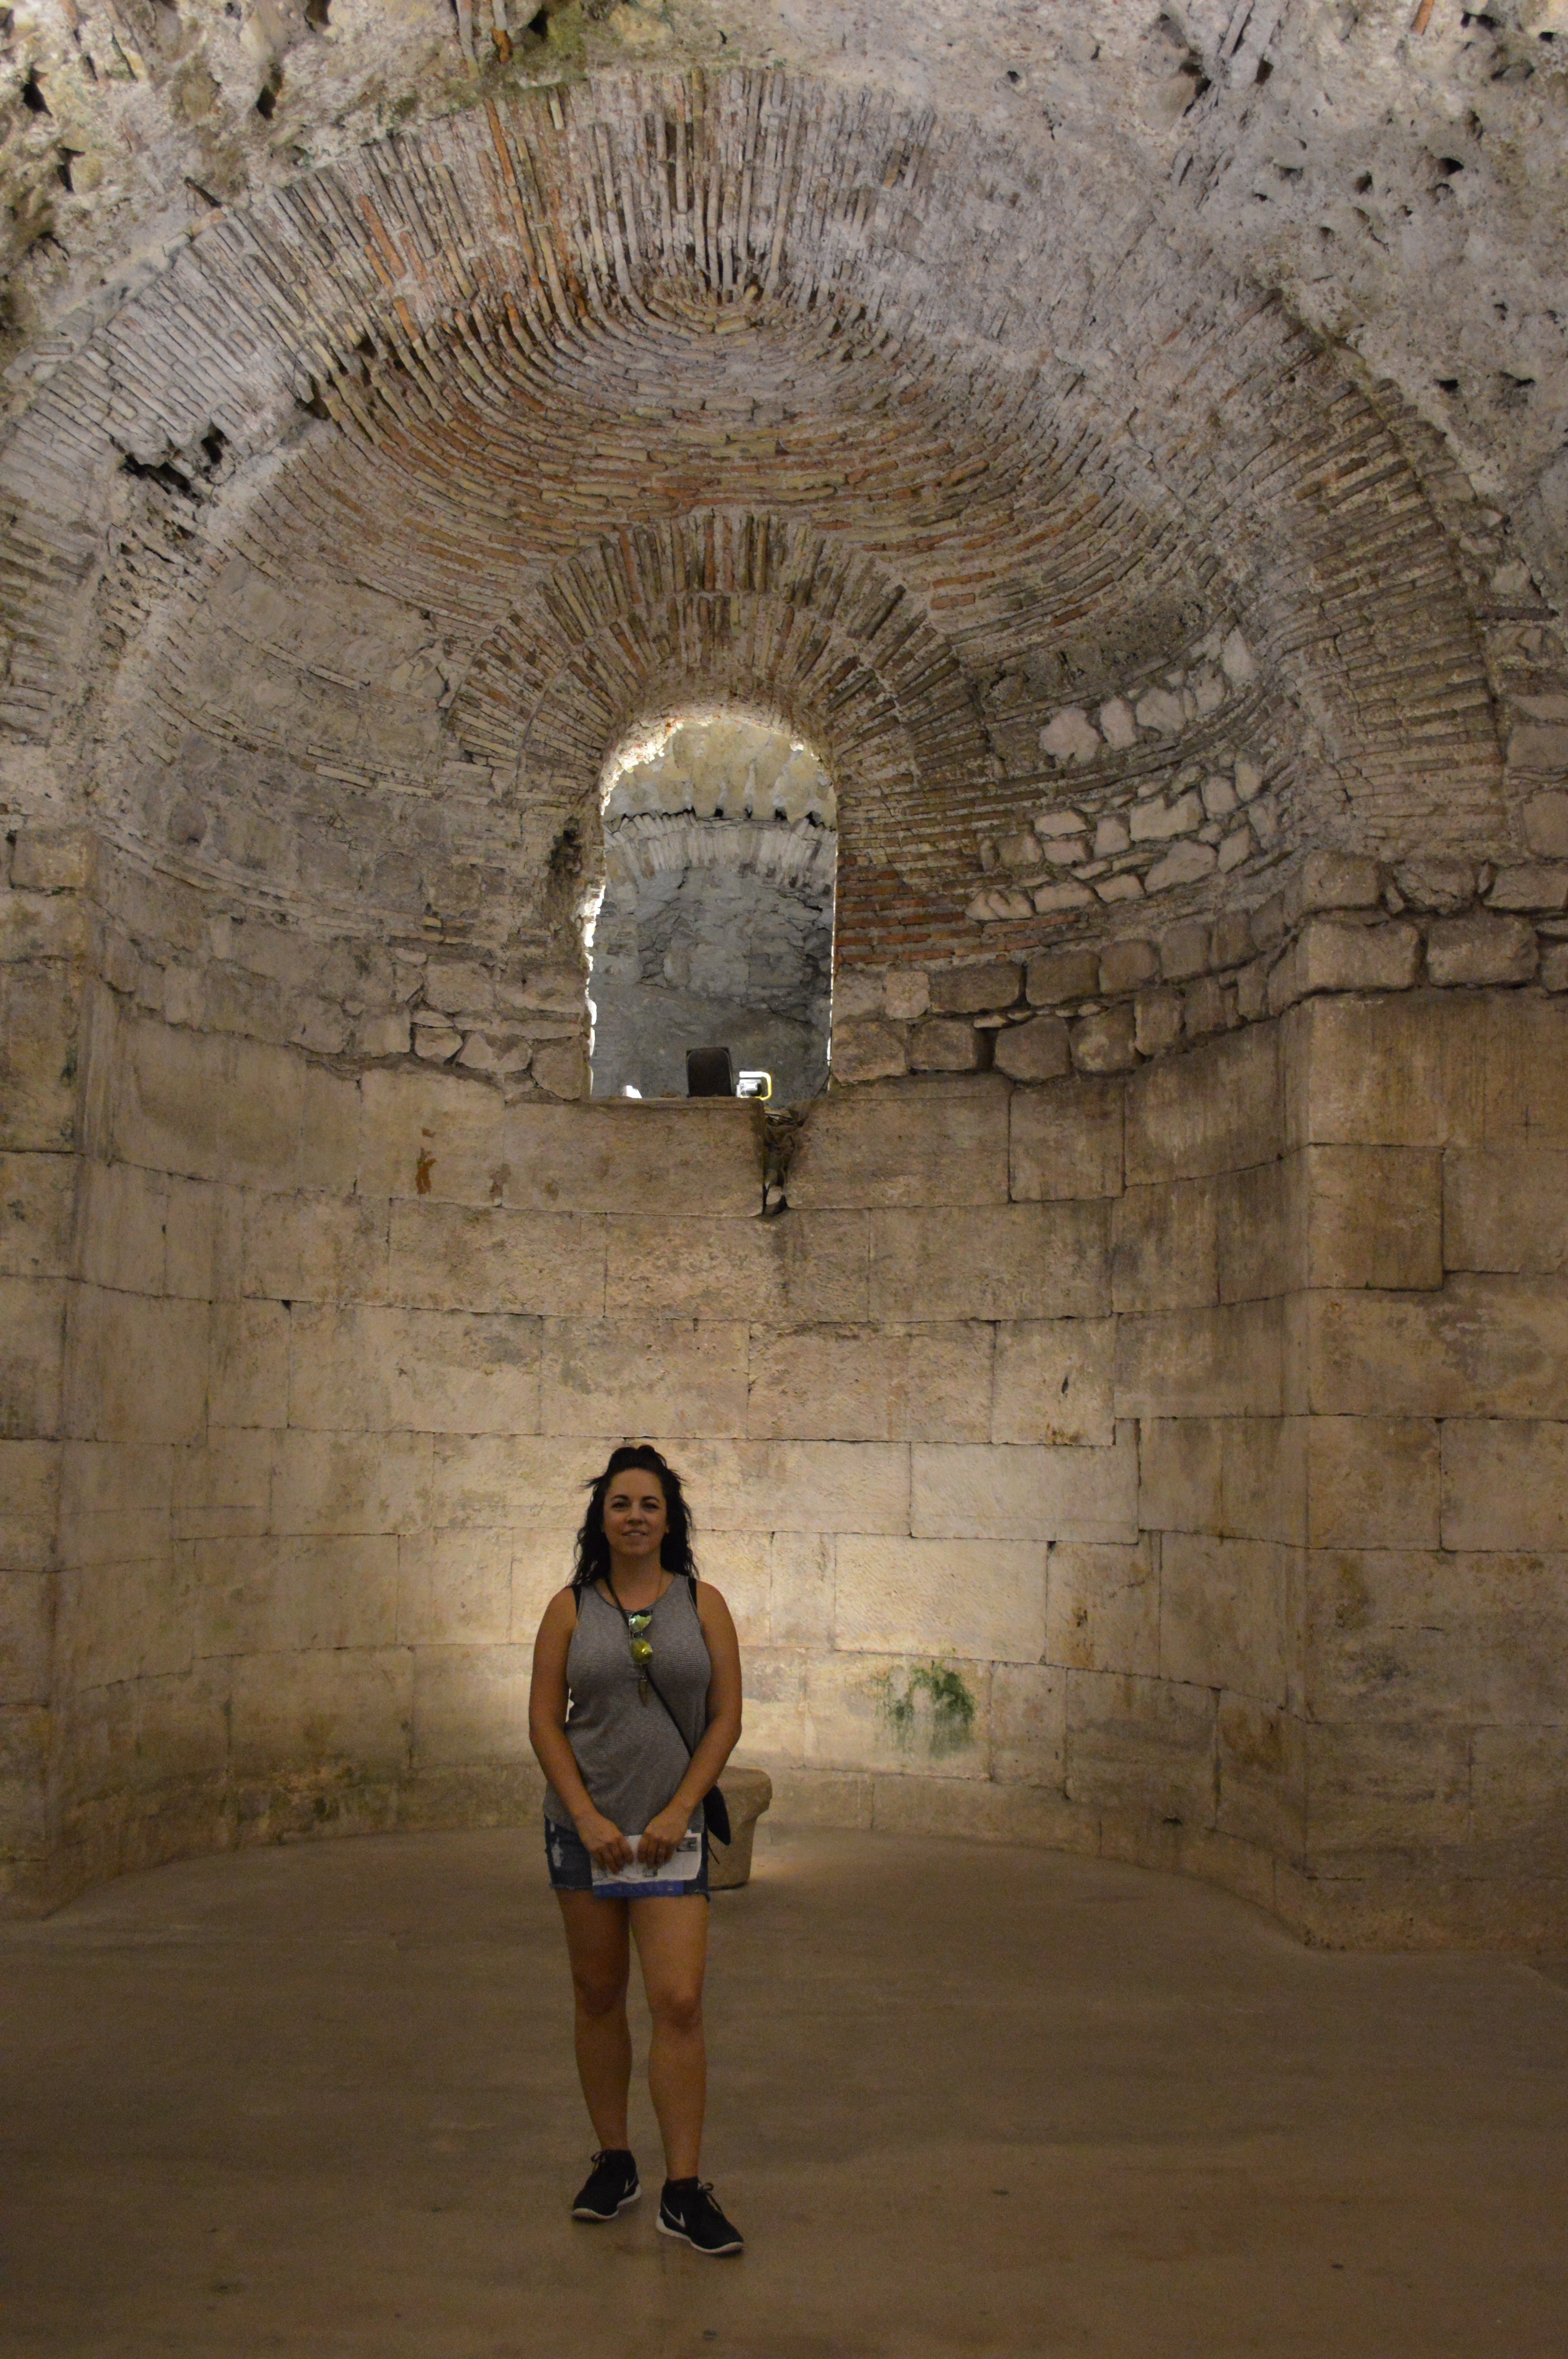 Diocletian's Palace cellars in Split, Croatia - cultivatedrambler.com